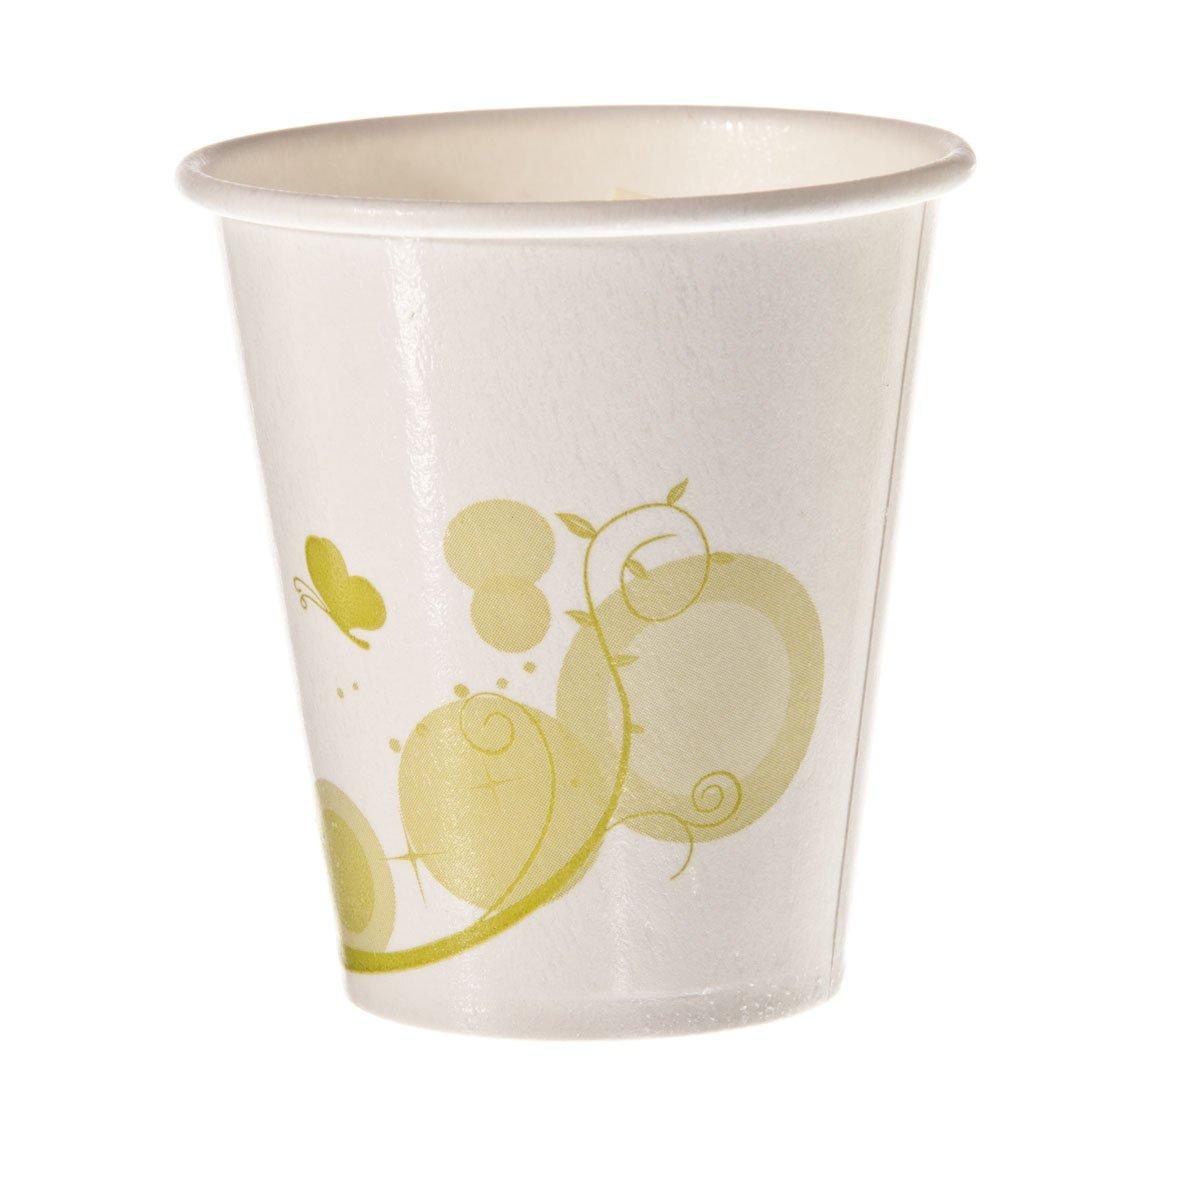 Medline NON05005Z Cup, Paper, 5 oz, Cold (Pack of 100)